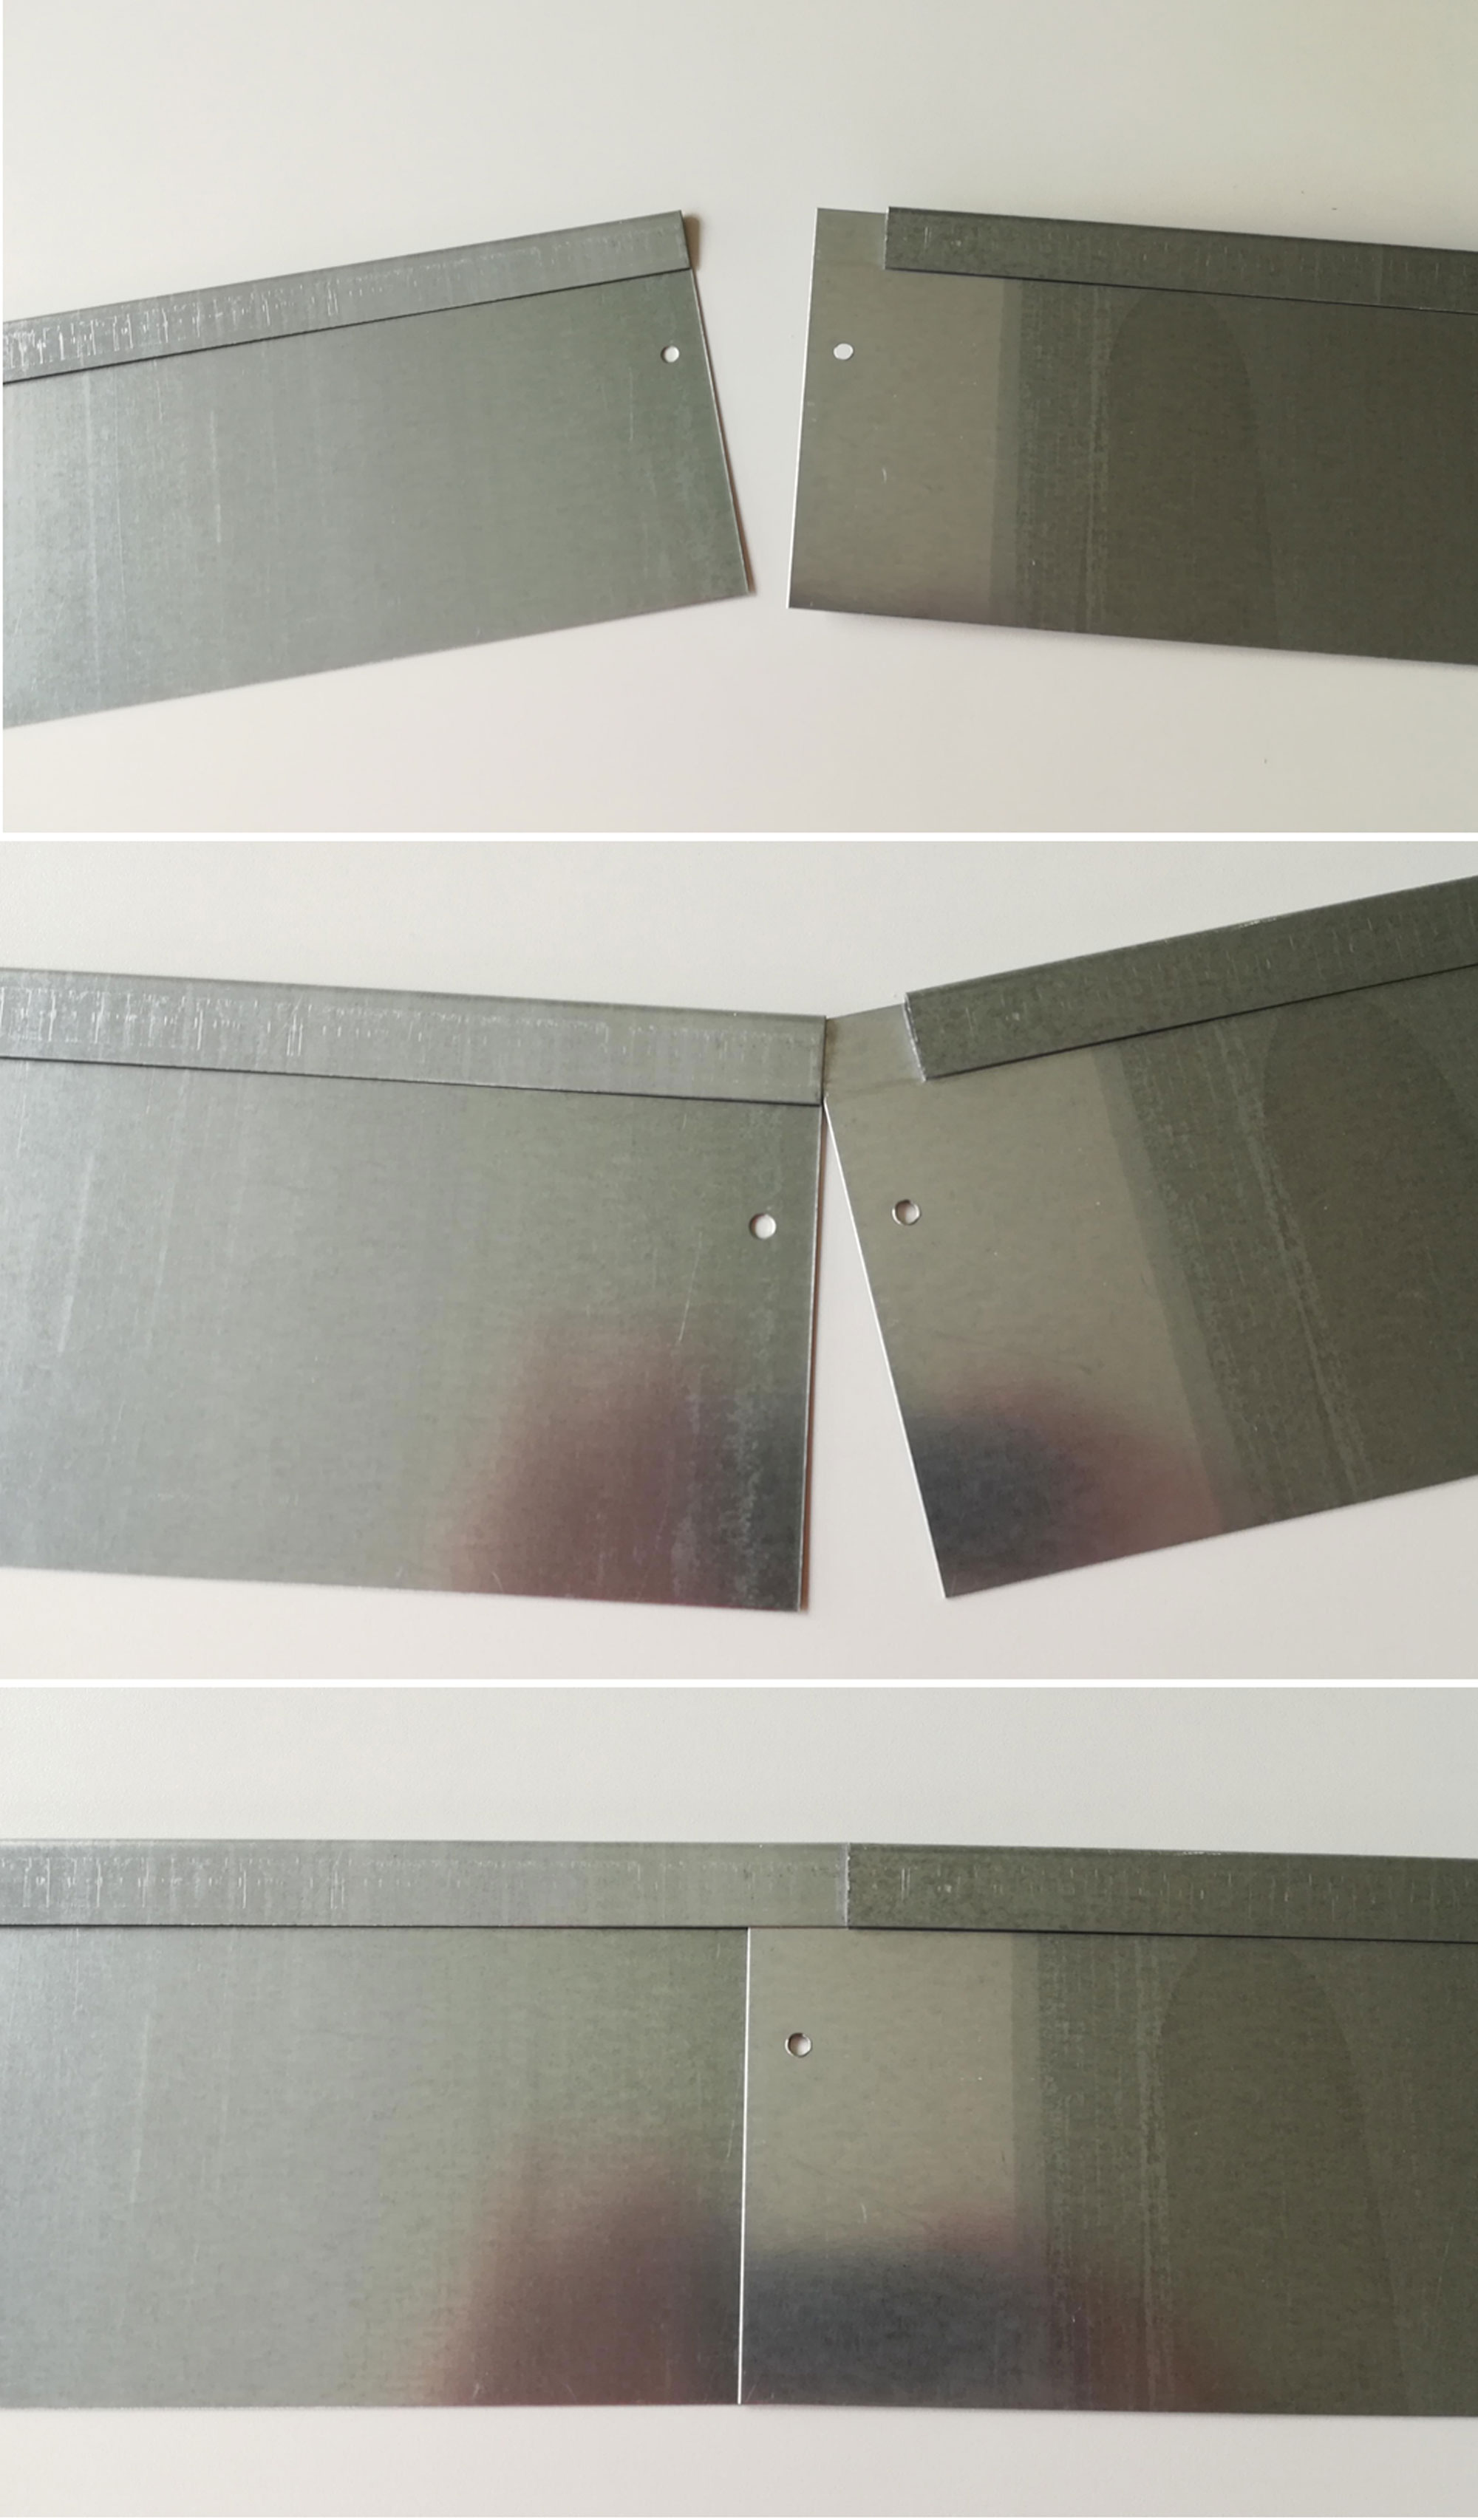 rasenkante metall 100x20cm bei. Black Bedroom Furniture Sets. Home Design Ideas